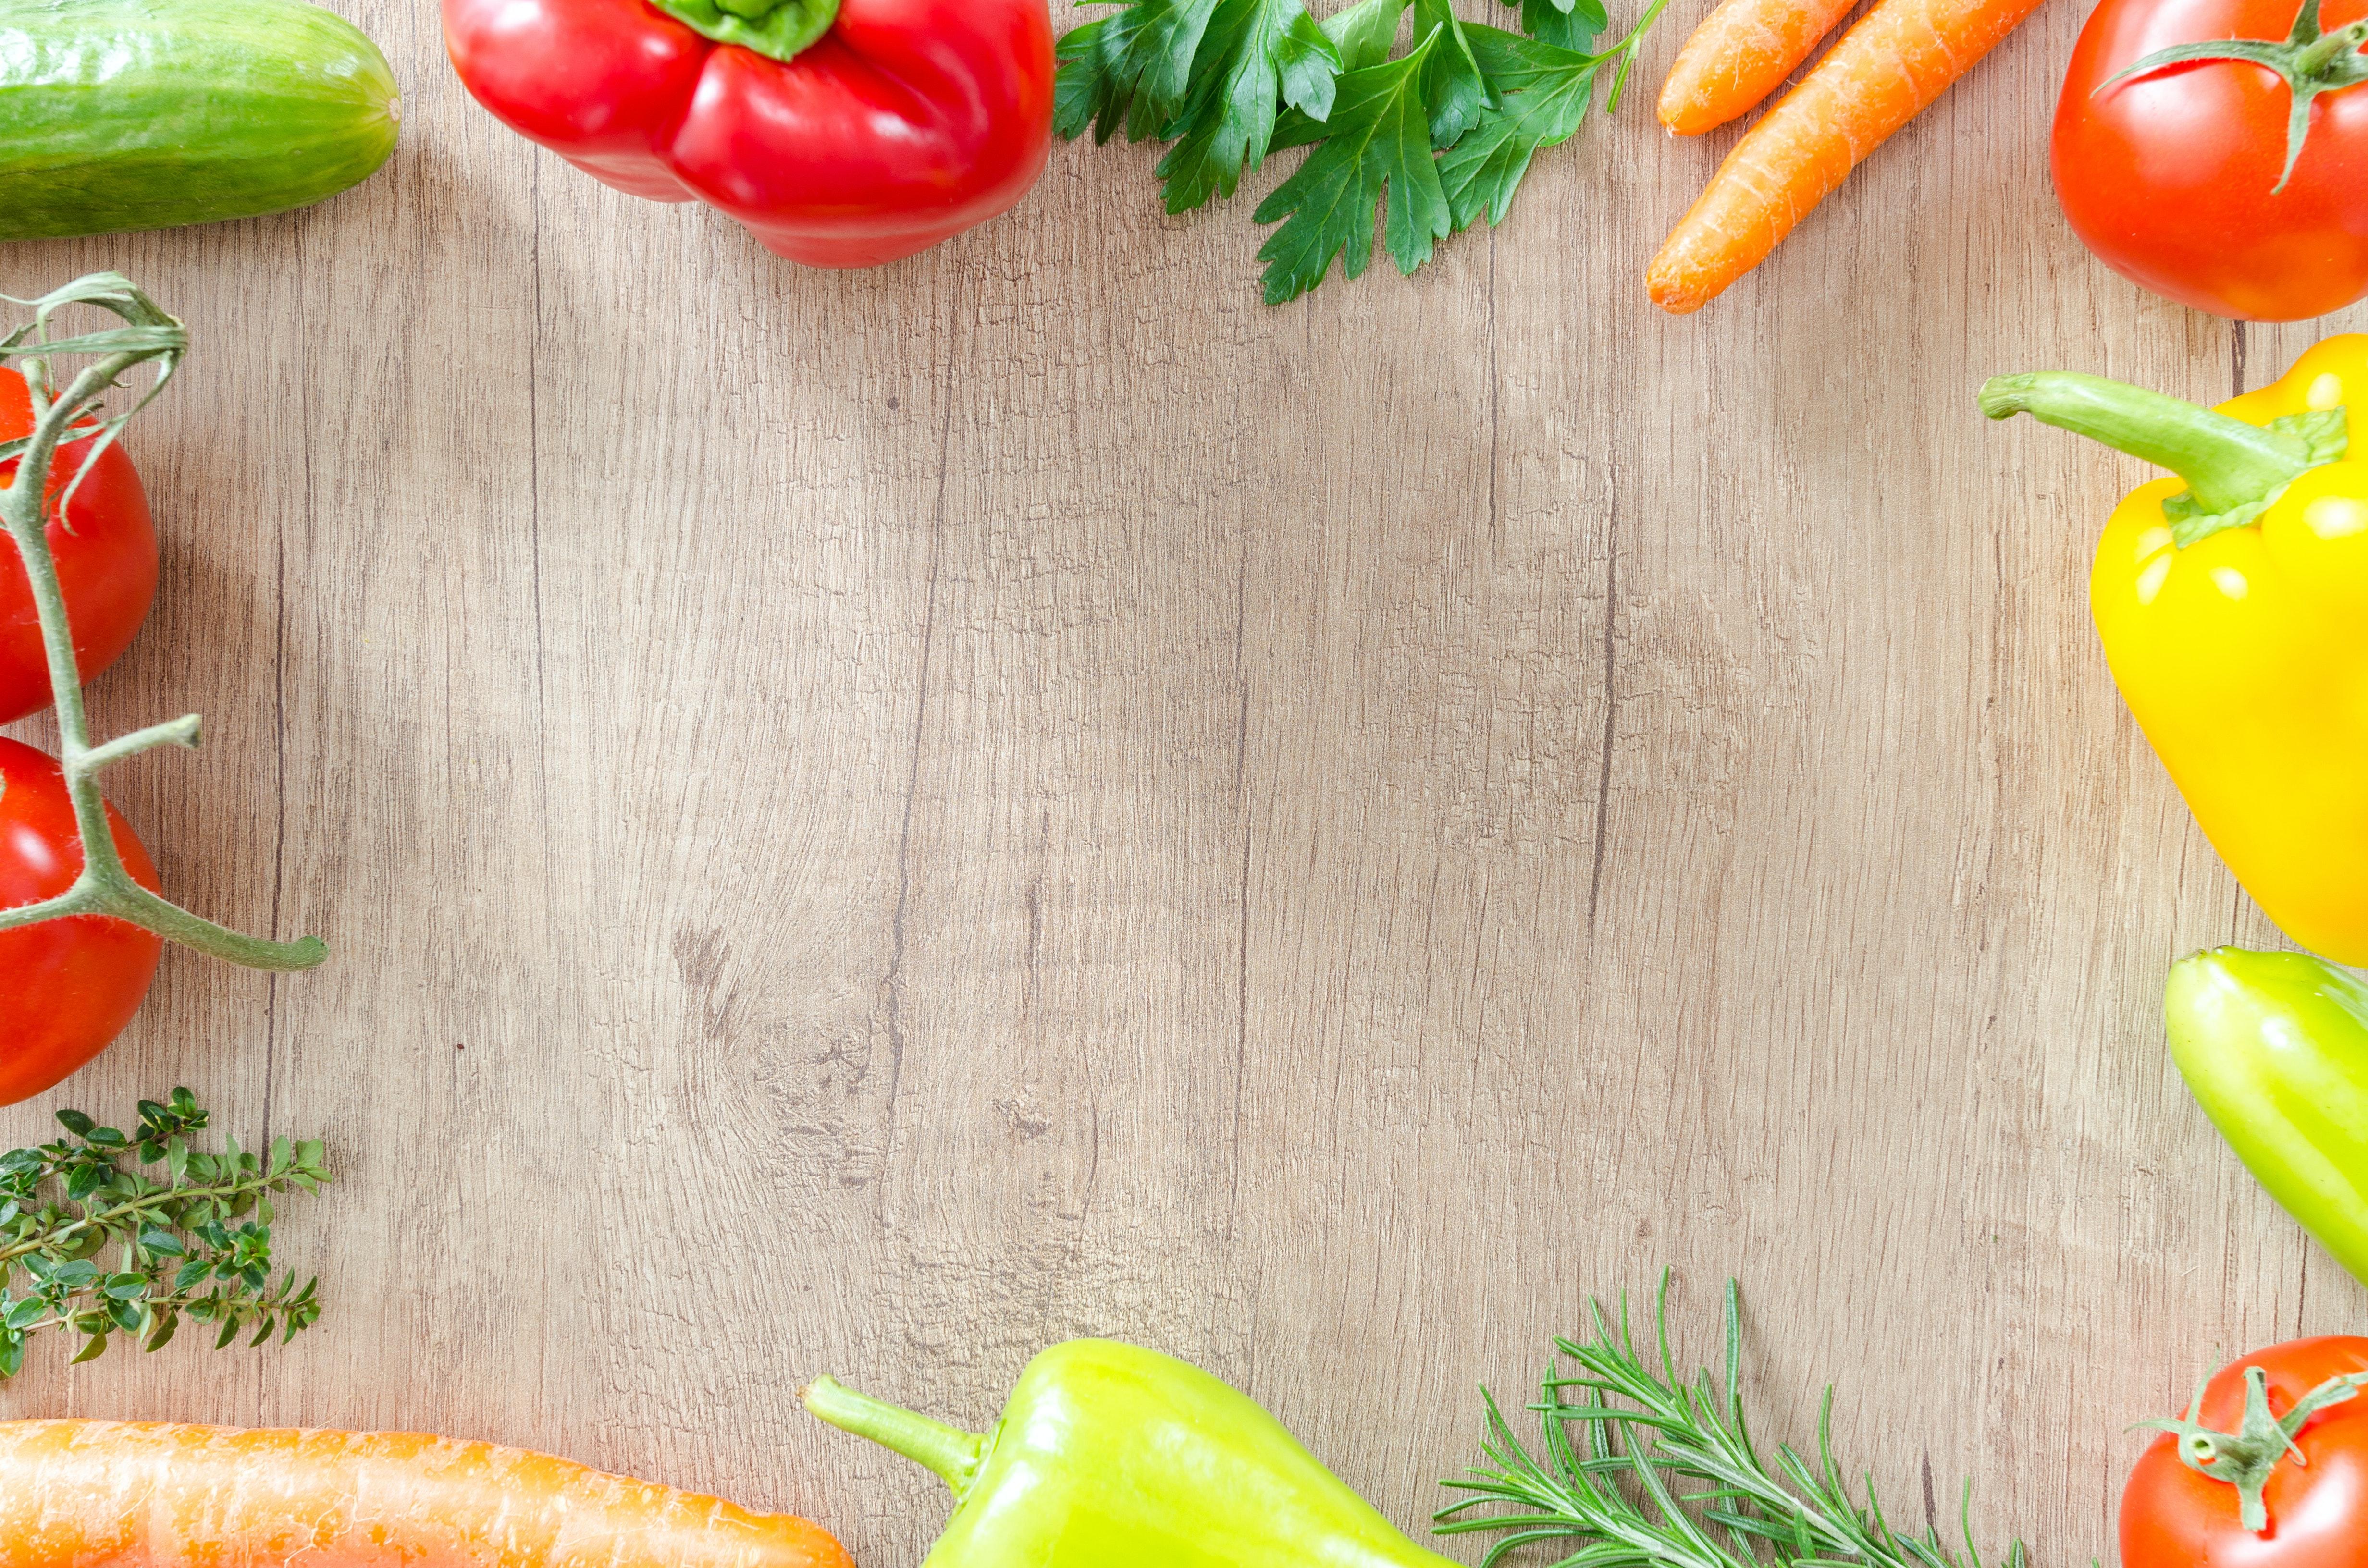 Food Photography · Pexels · Free Stock Photos